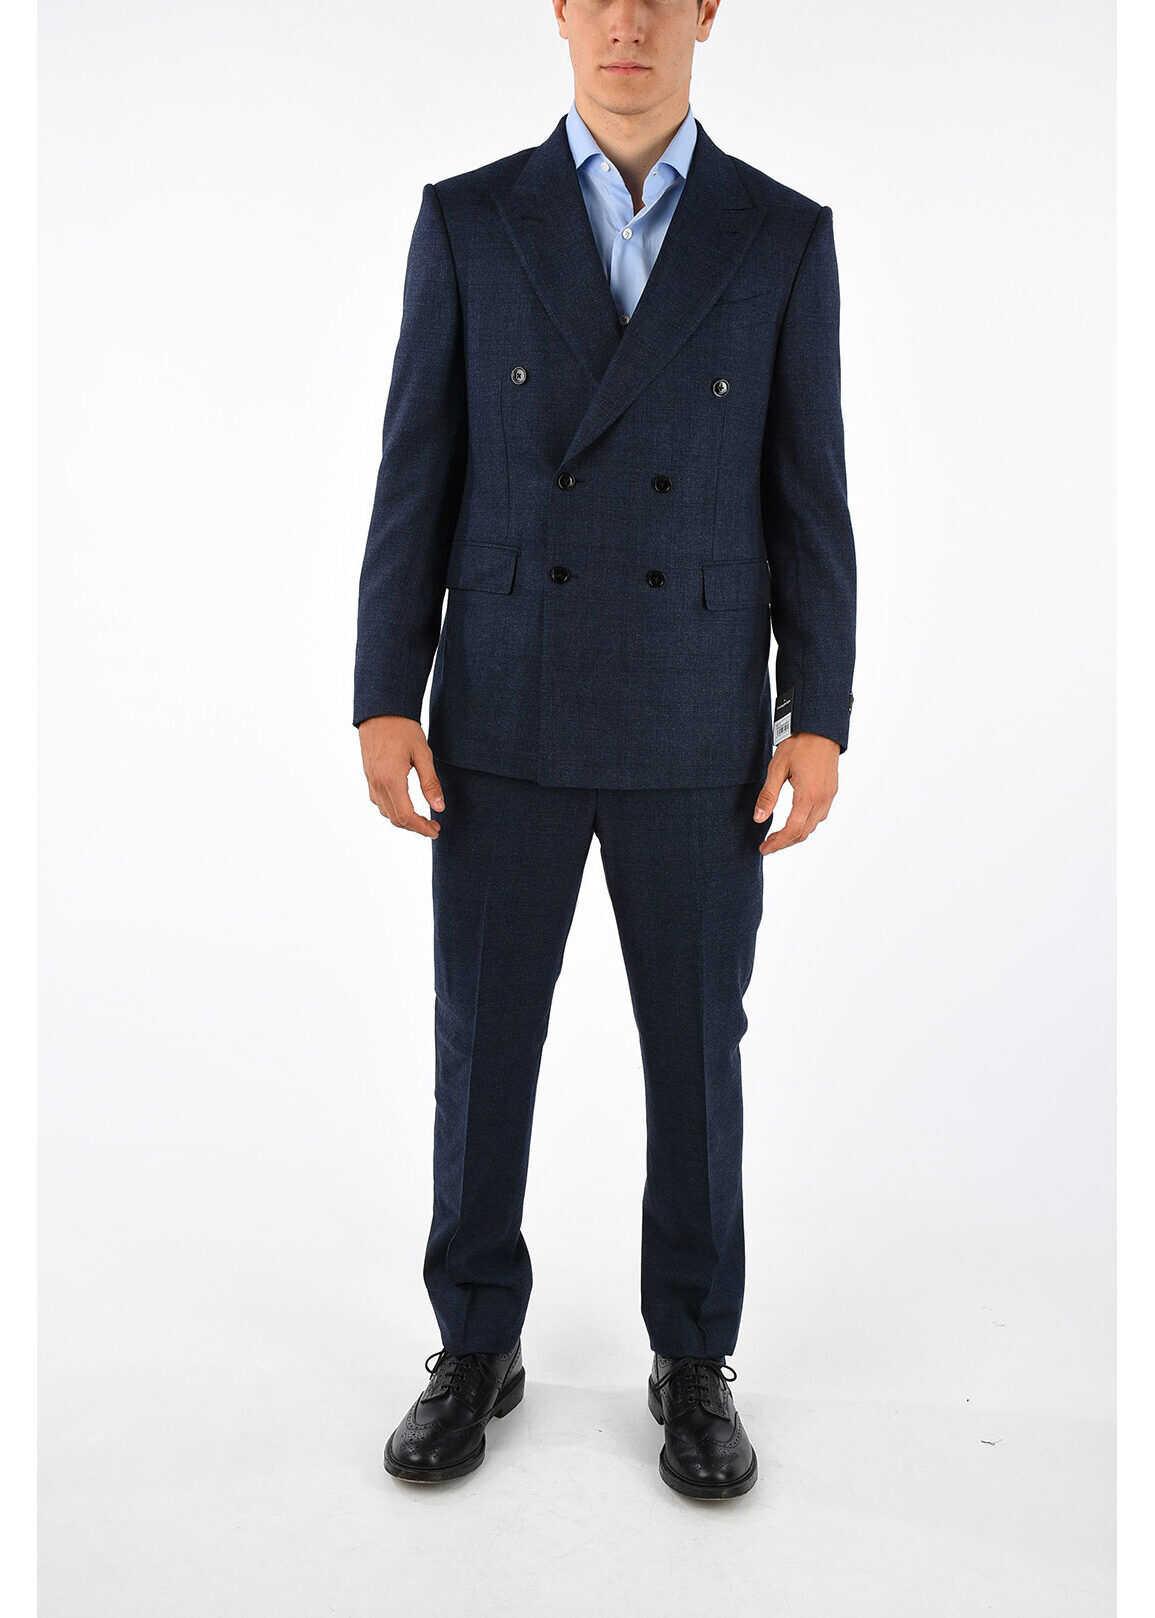 Ermenegildo Zegna Cashmere Silk Suit BLUE